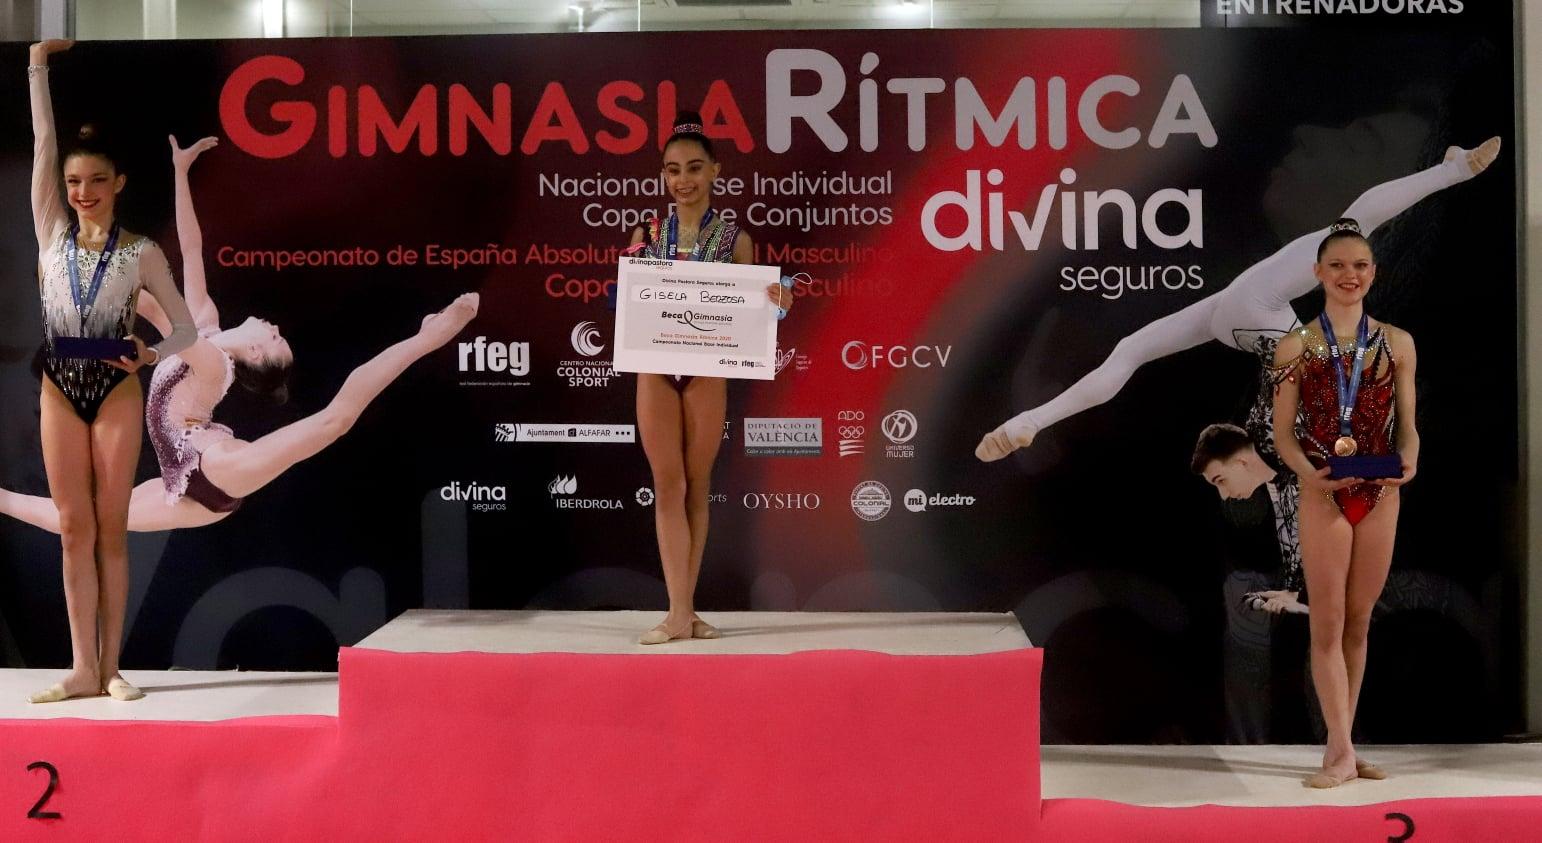 Podium Gymnastics Jennifer Colino